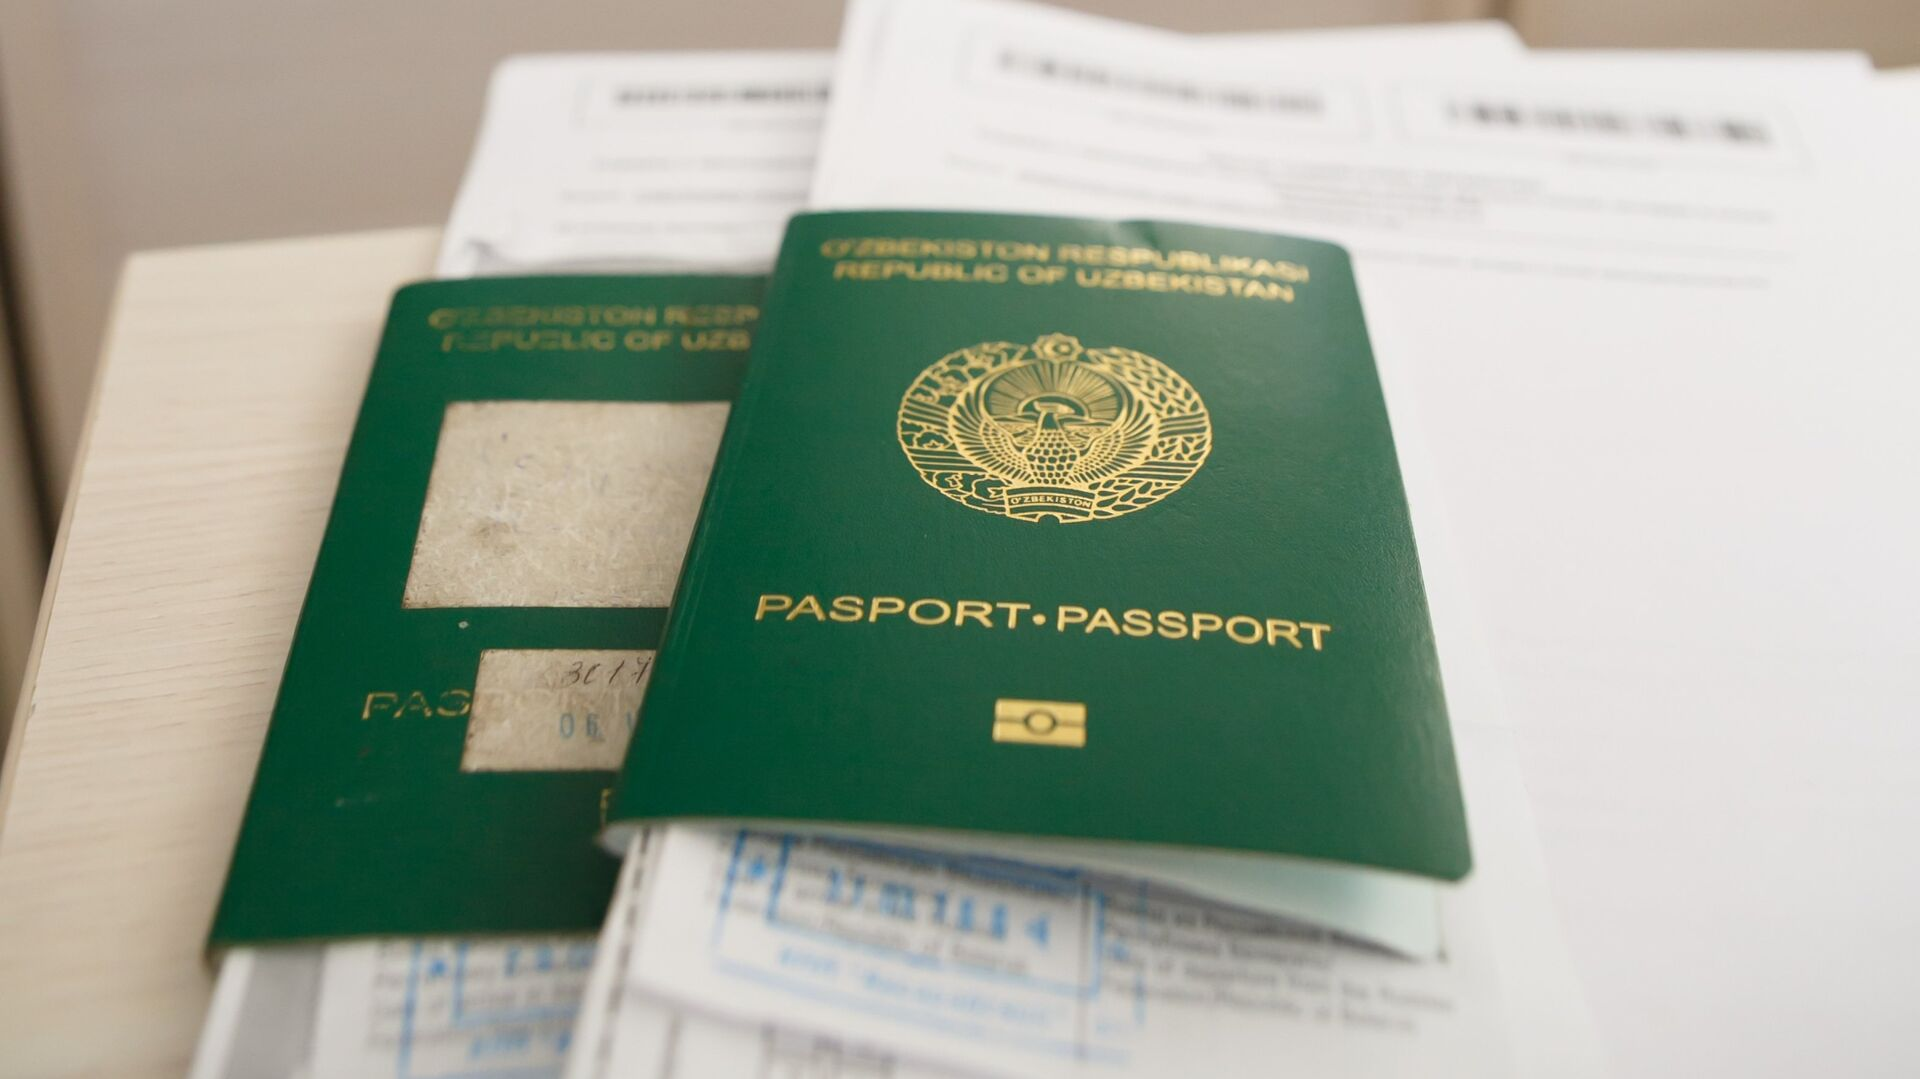 Паспорт гражданина Узбекистана, архивное фото - Sputnik Тоҷикистон, 1920, 28.09.2021